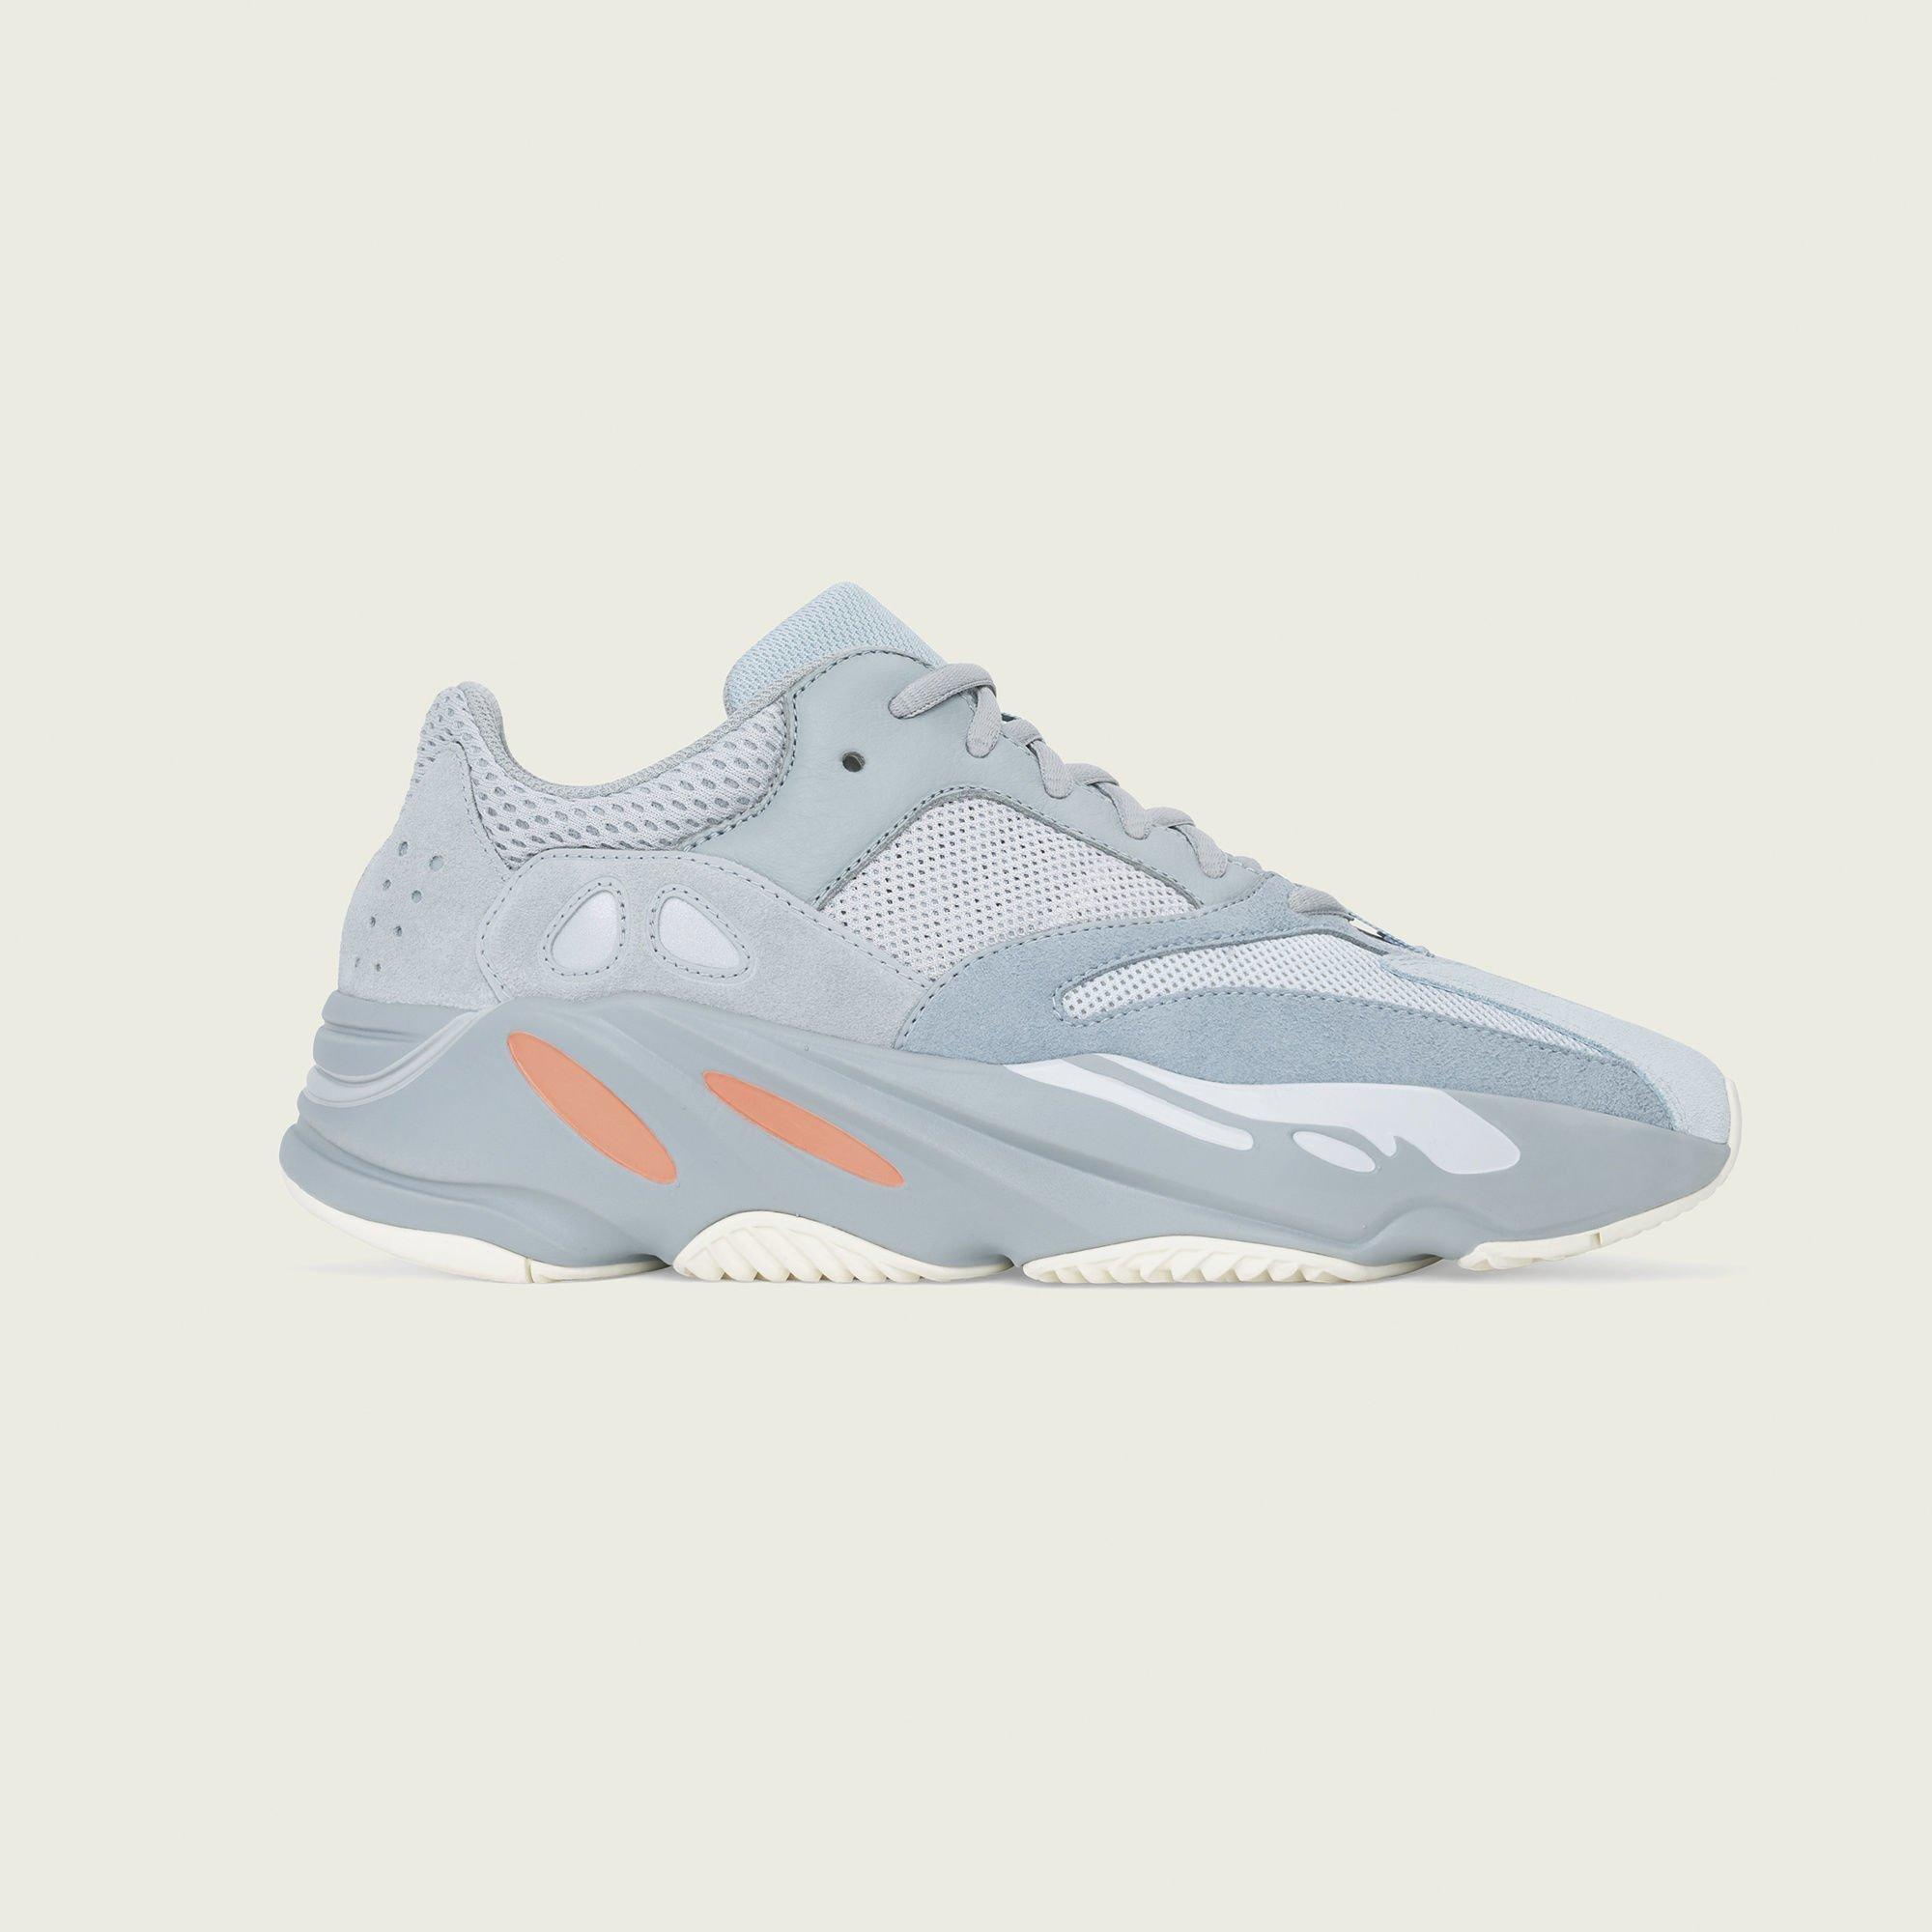 Adidas Yeezy Boost 700 EG7597